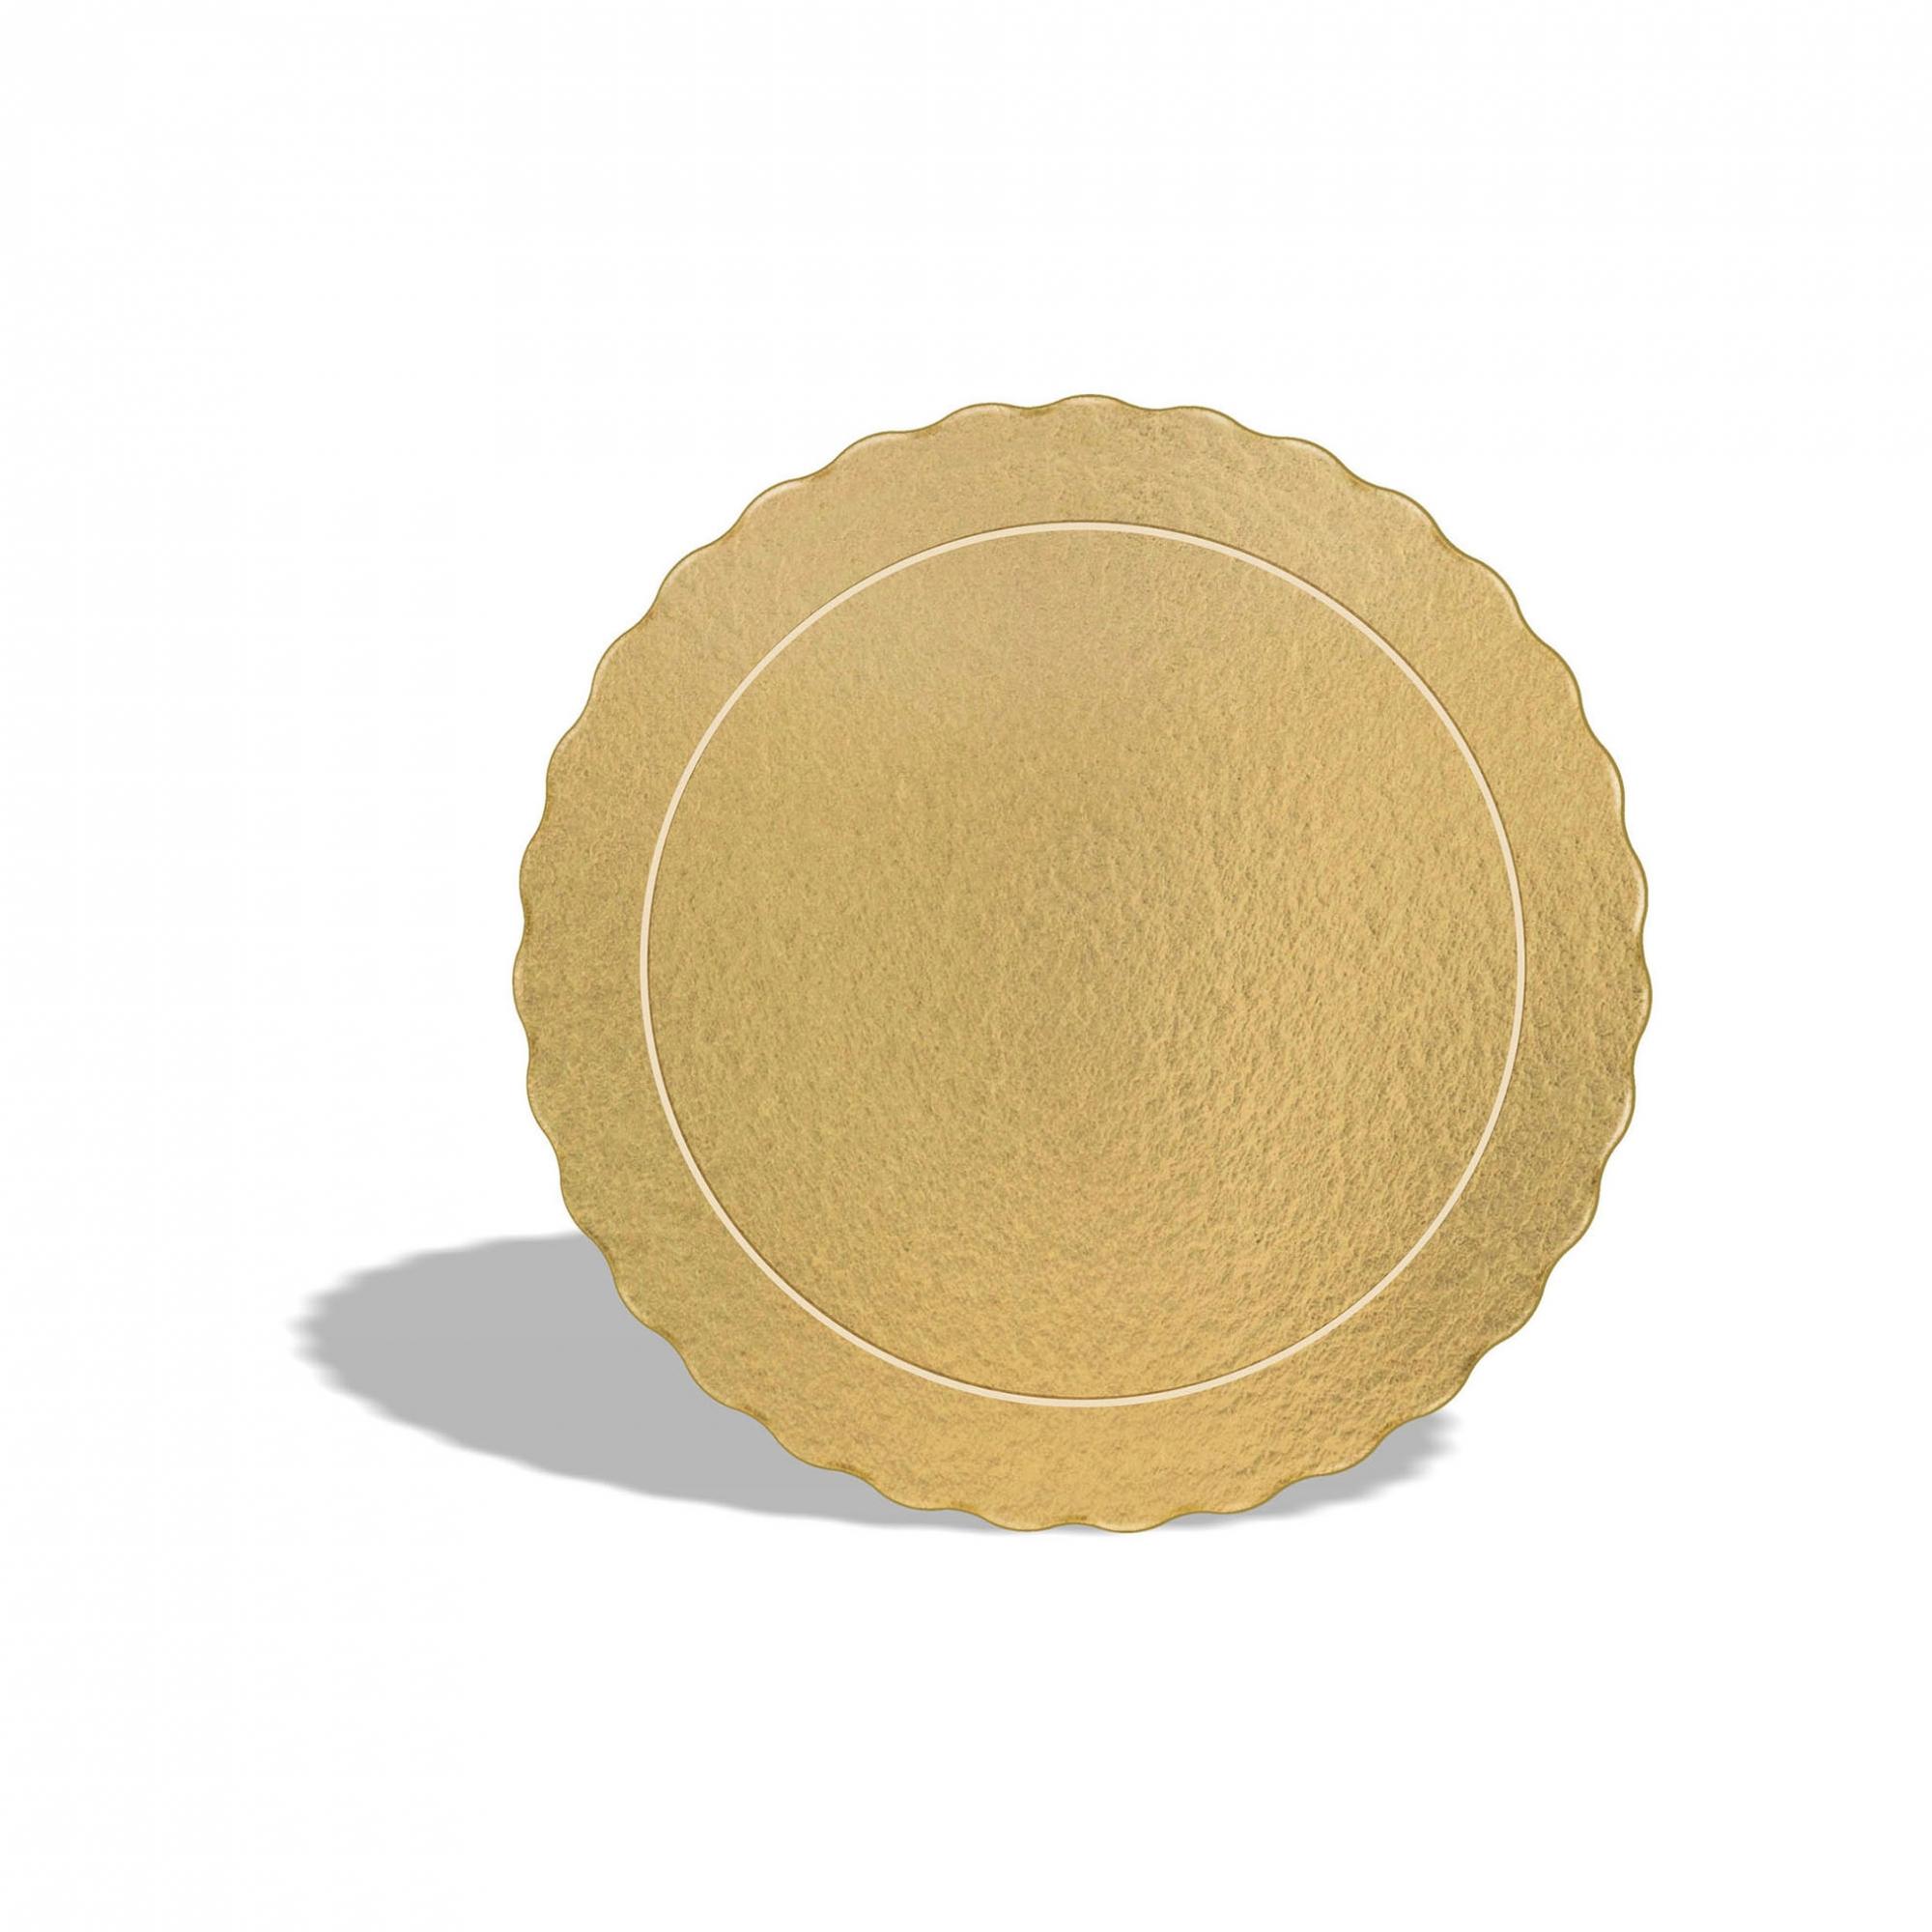 100 Bases Laminadas, Suporte P/ Bolo, Cake Board, 23cm - Ouro